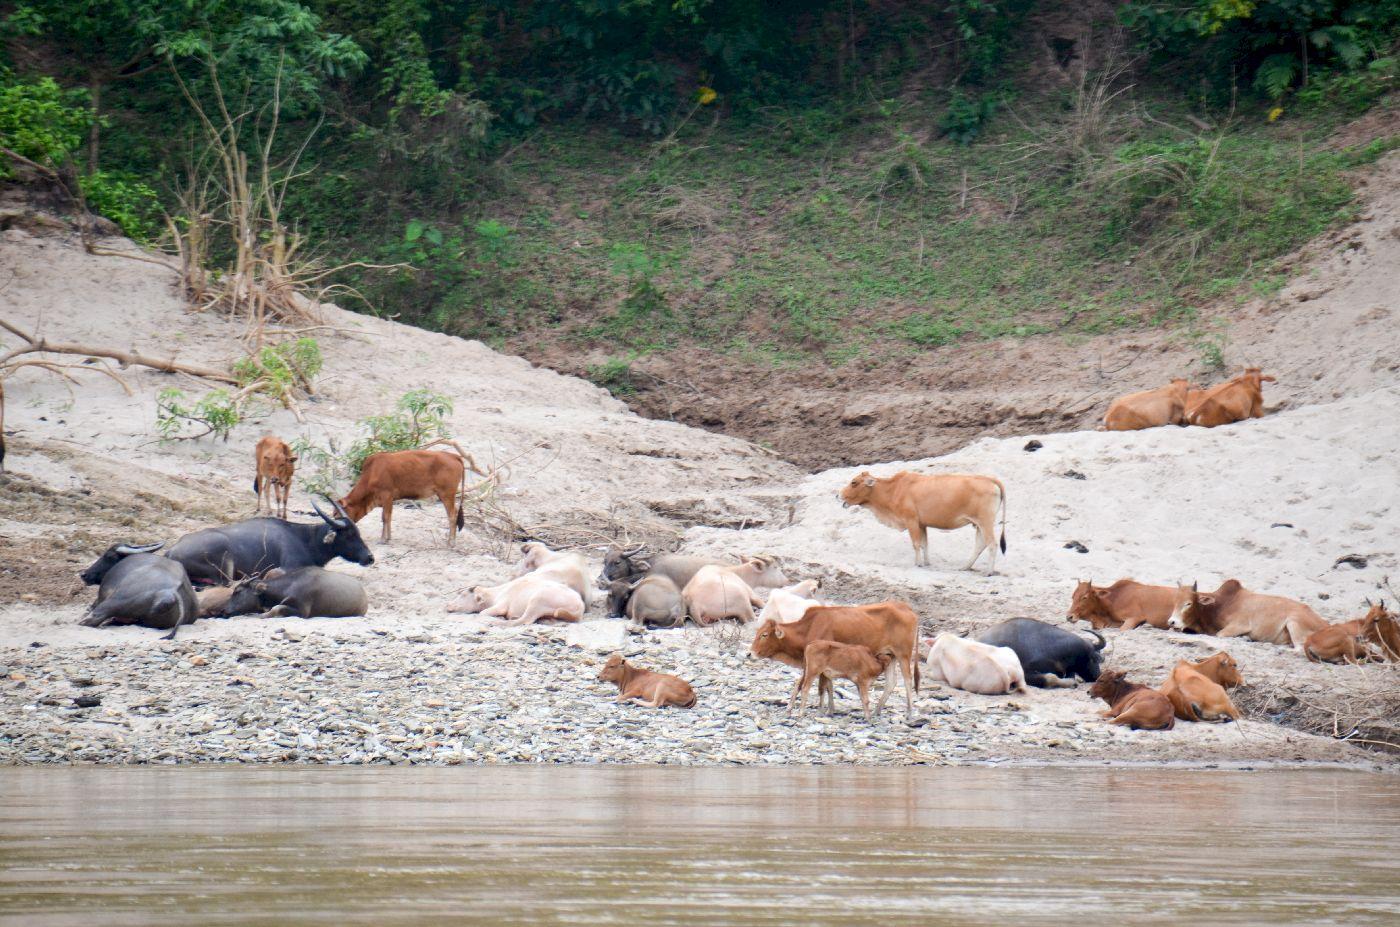 https://blogvoyages.fr/wp-content/uploads/2018/01/Mekong-laos-0127.jpg